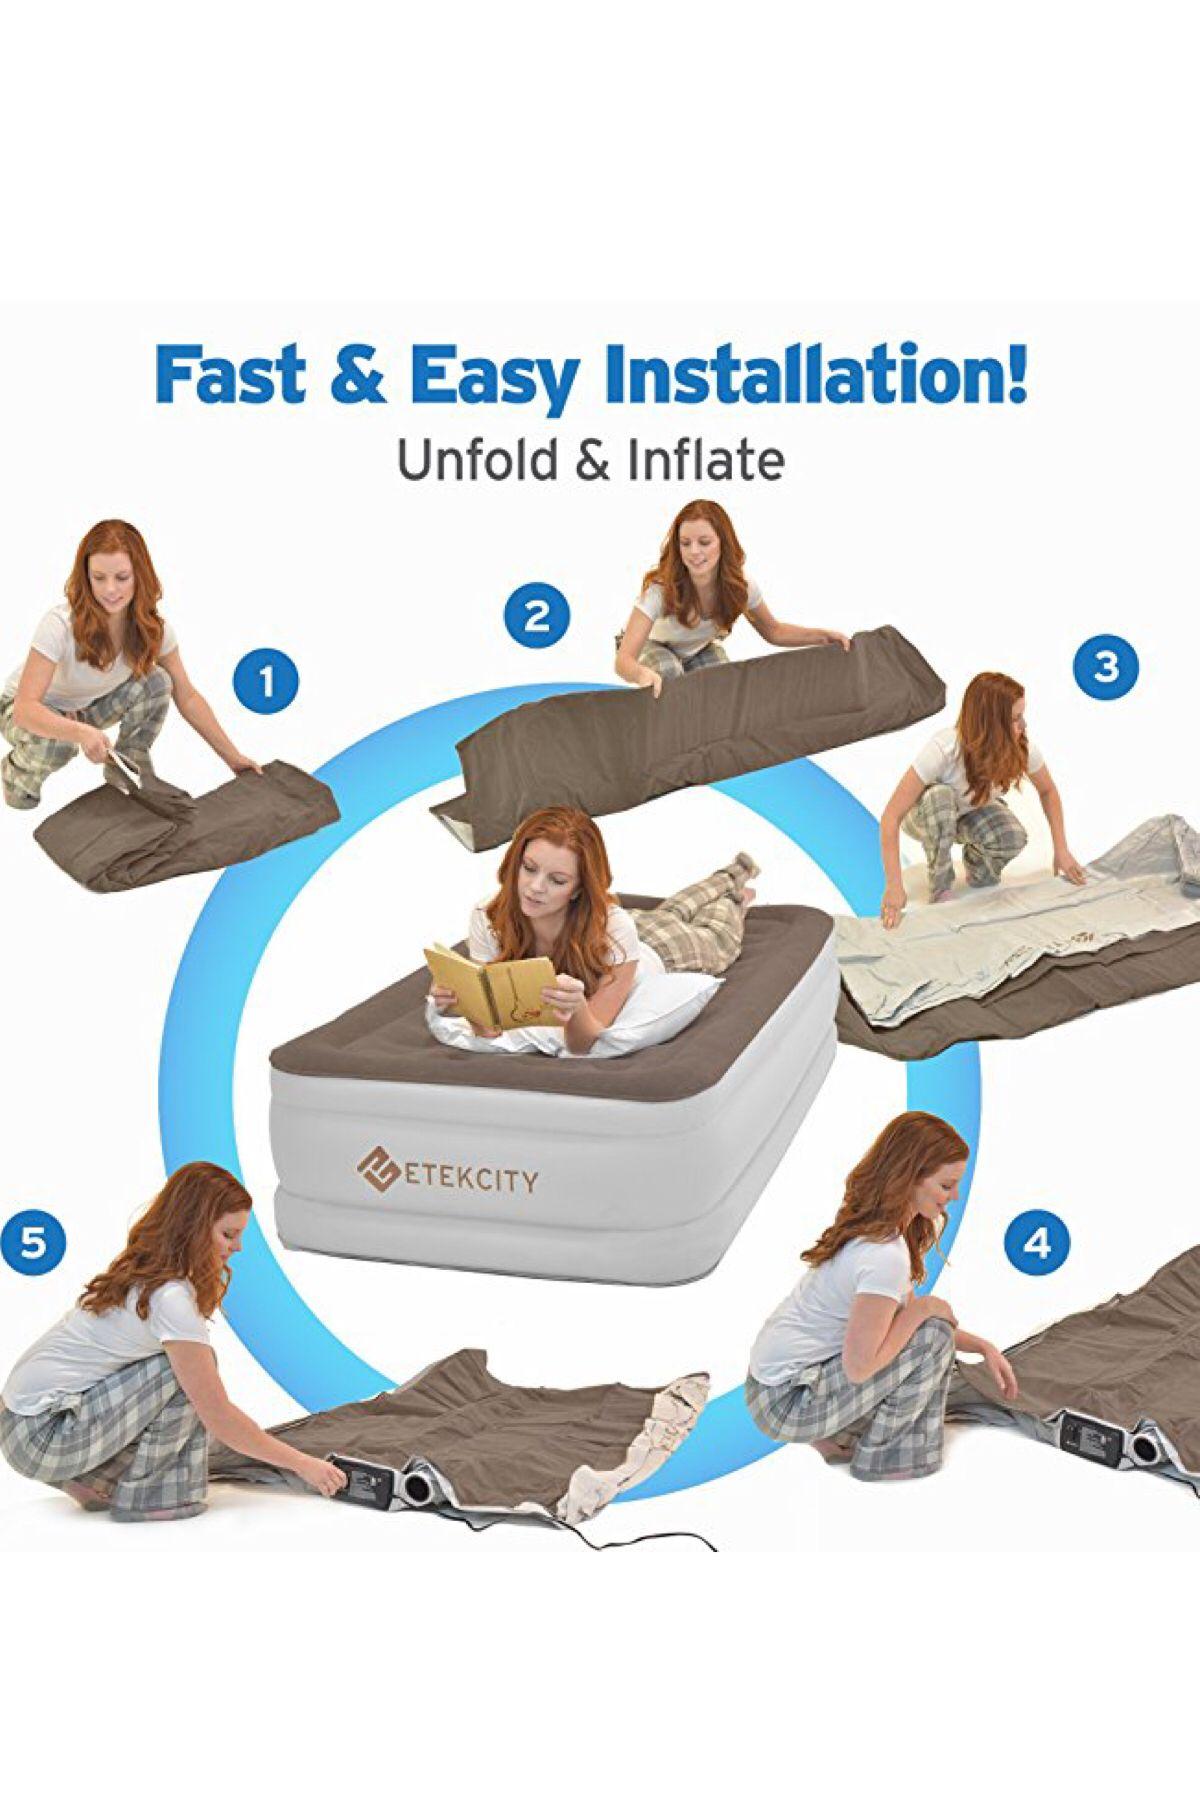 Etekcity upgraded air mattress blow up elevated raised